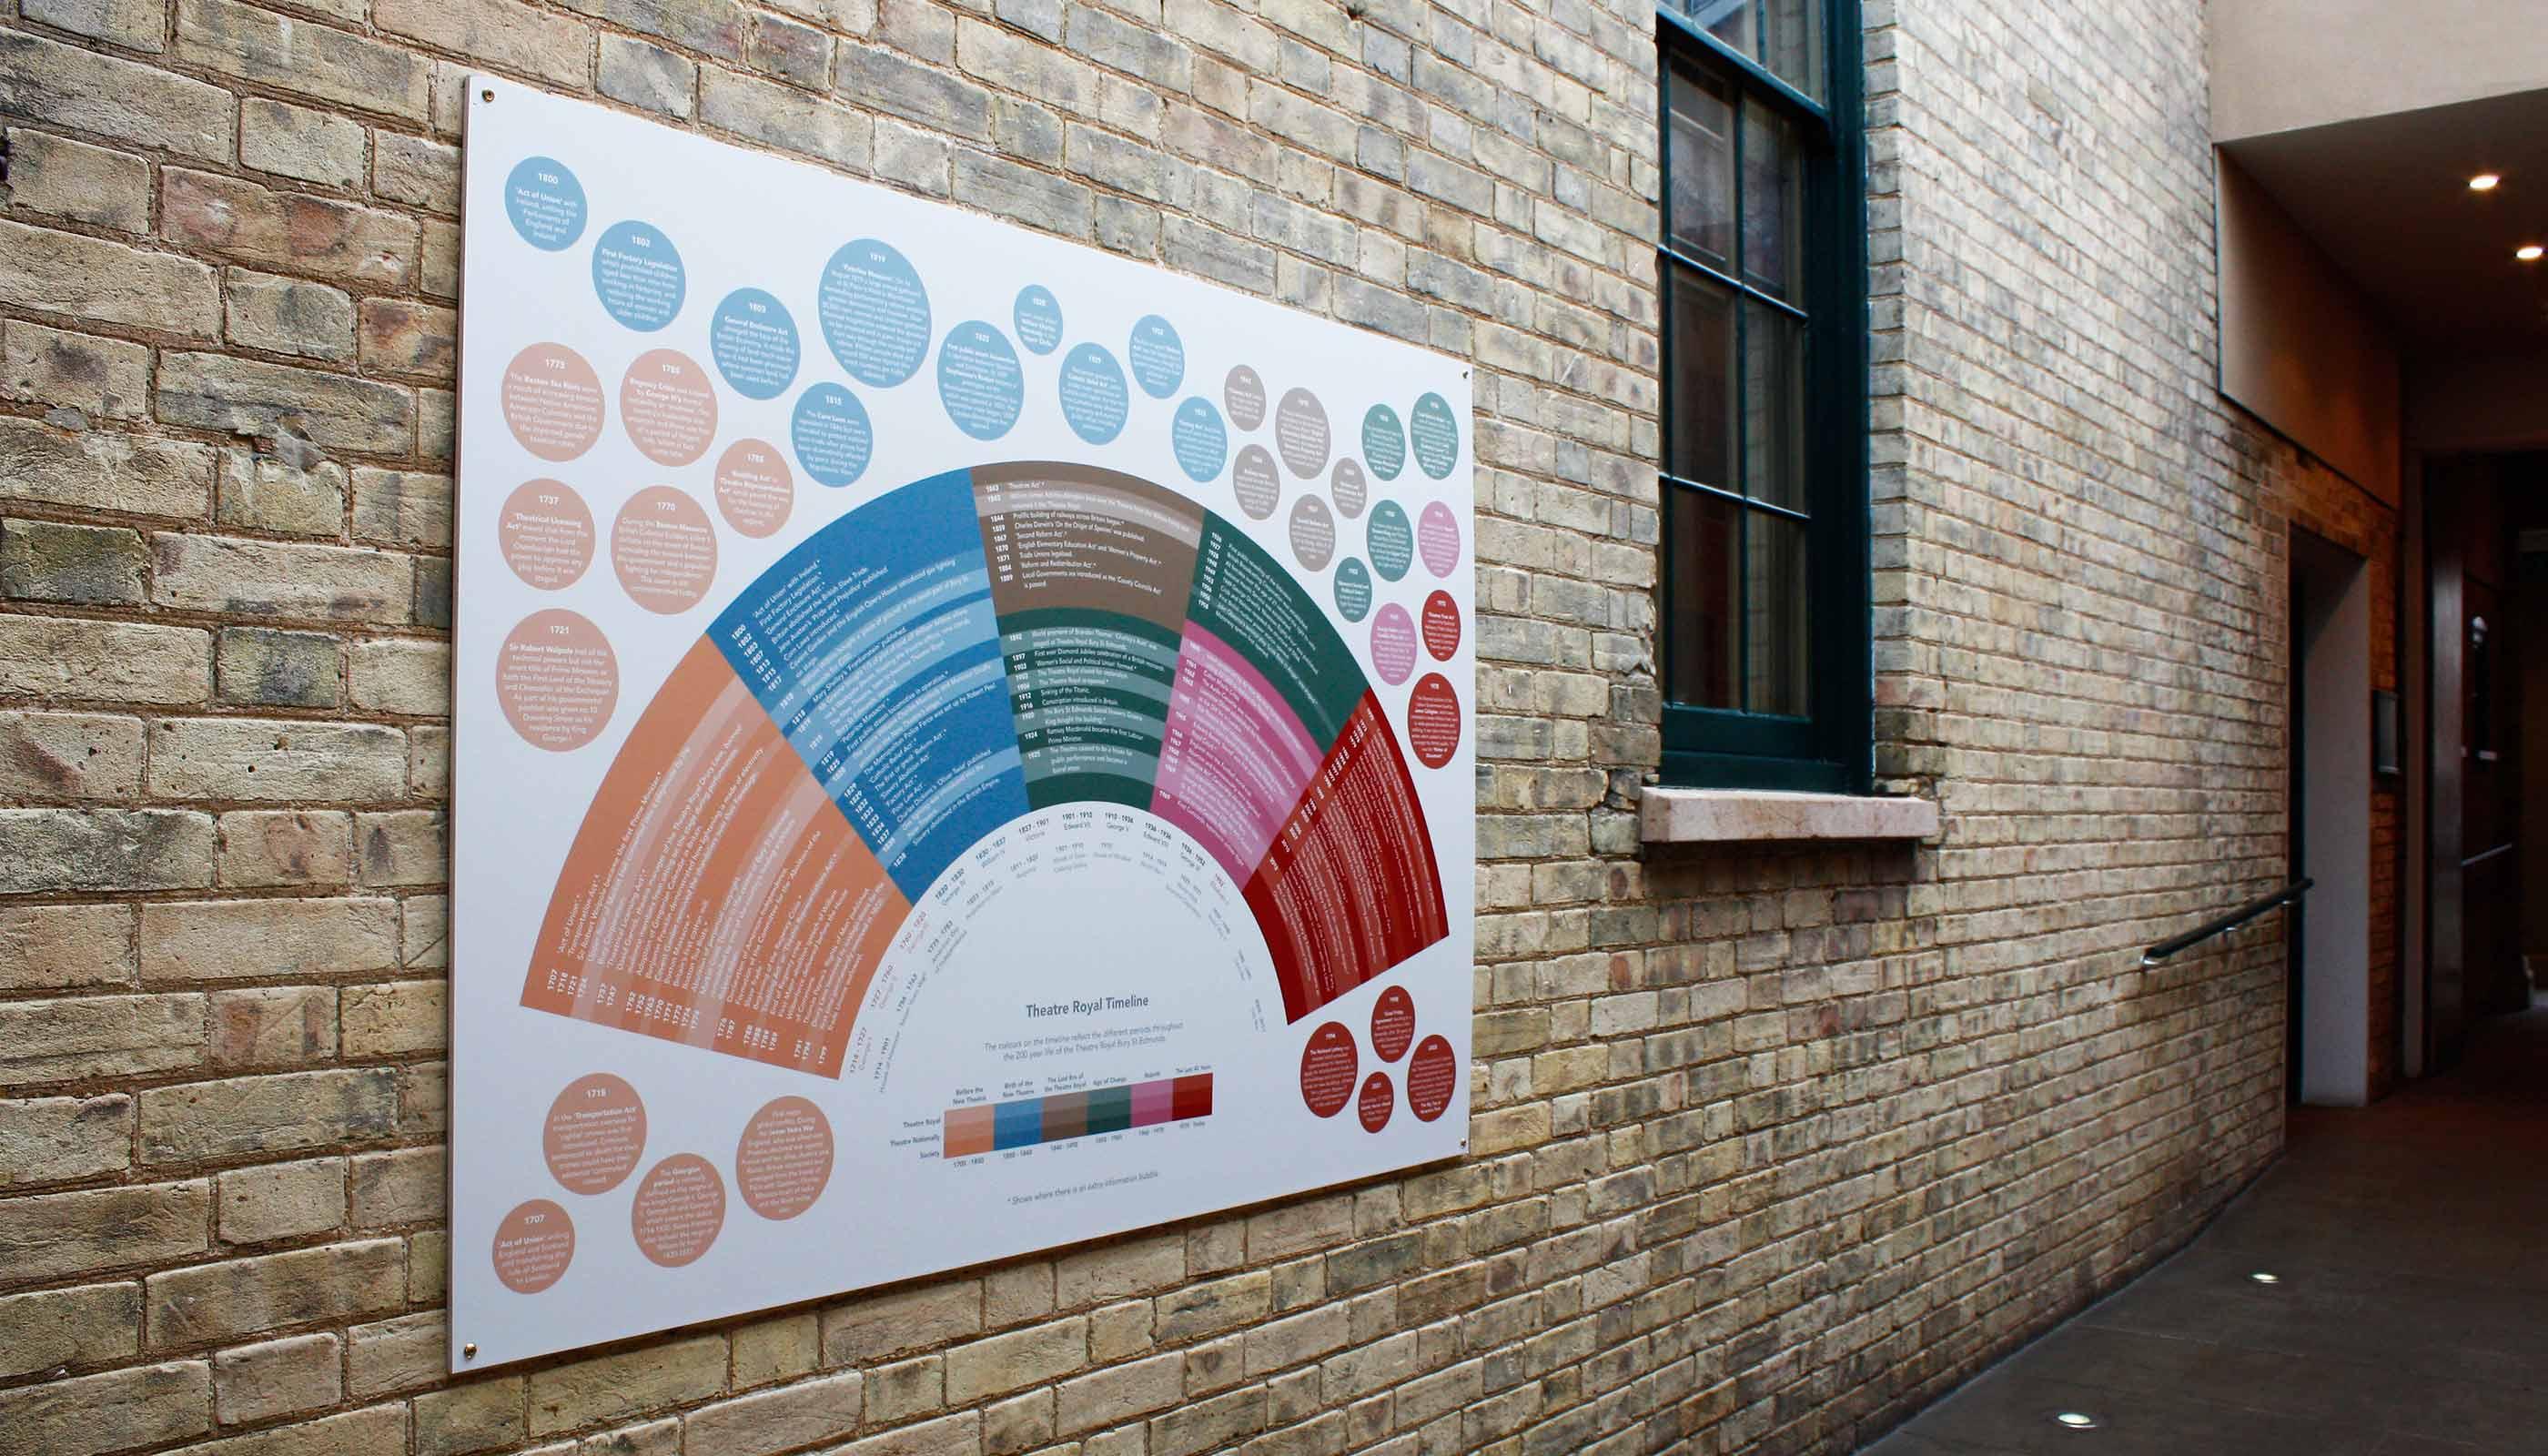 Timeline design for Theatre Royal in Bury St Edmunds, Suffolk.